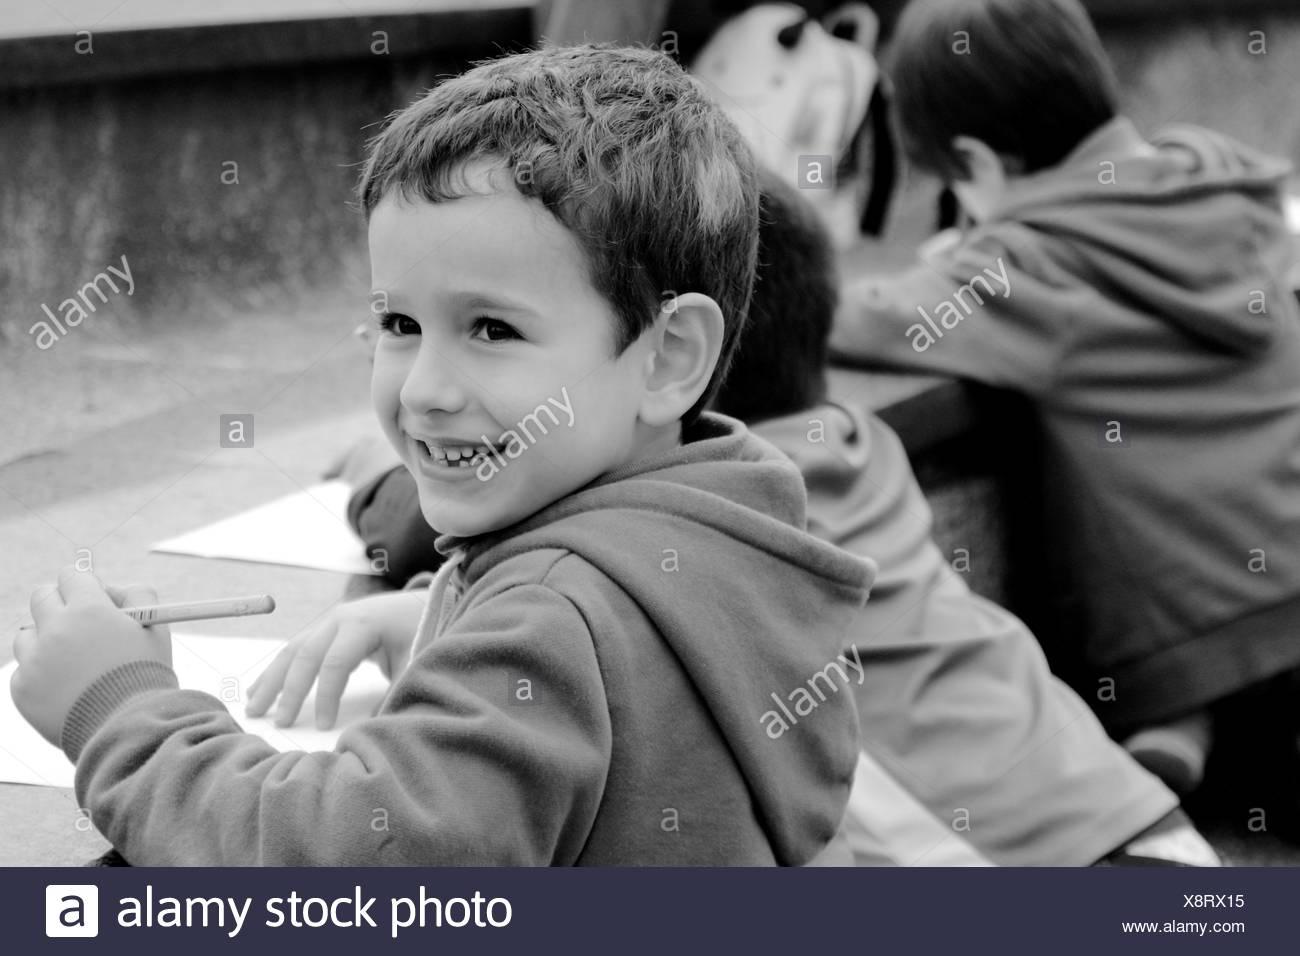 Cina, isola di Hong Kong, Hong Kong, ragazzo (4-5) sorridere mentre disegno, persone in background Immagini Stock